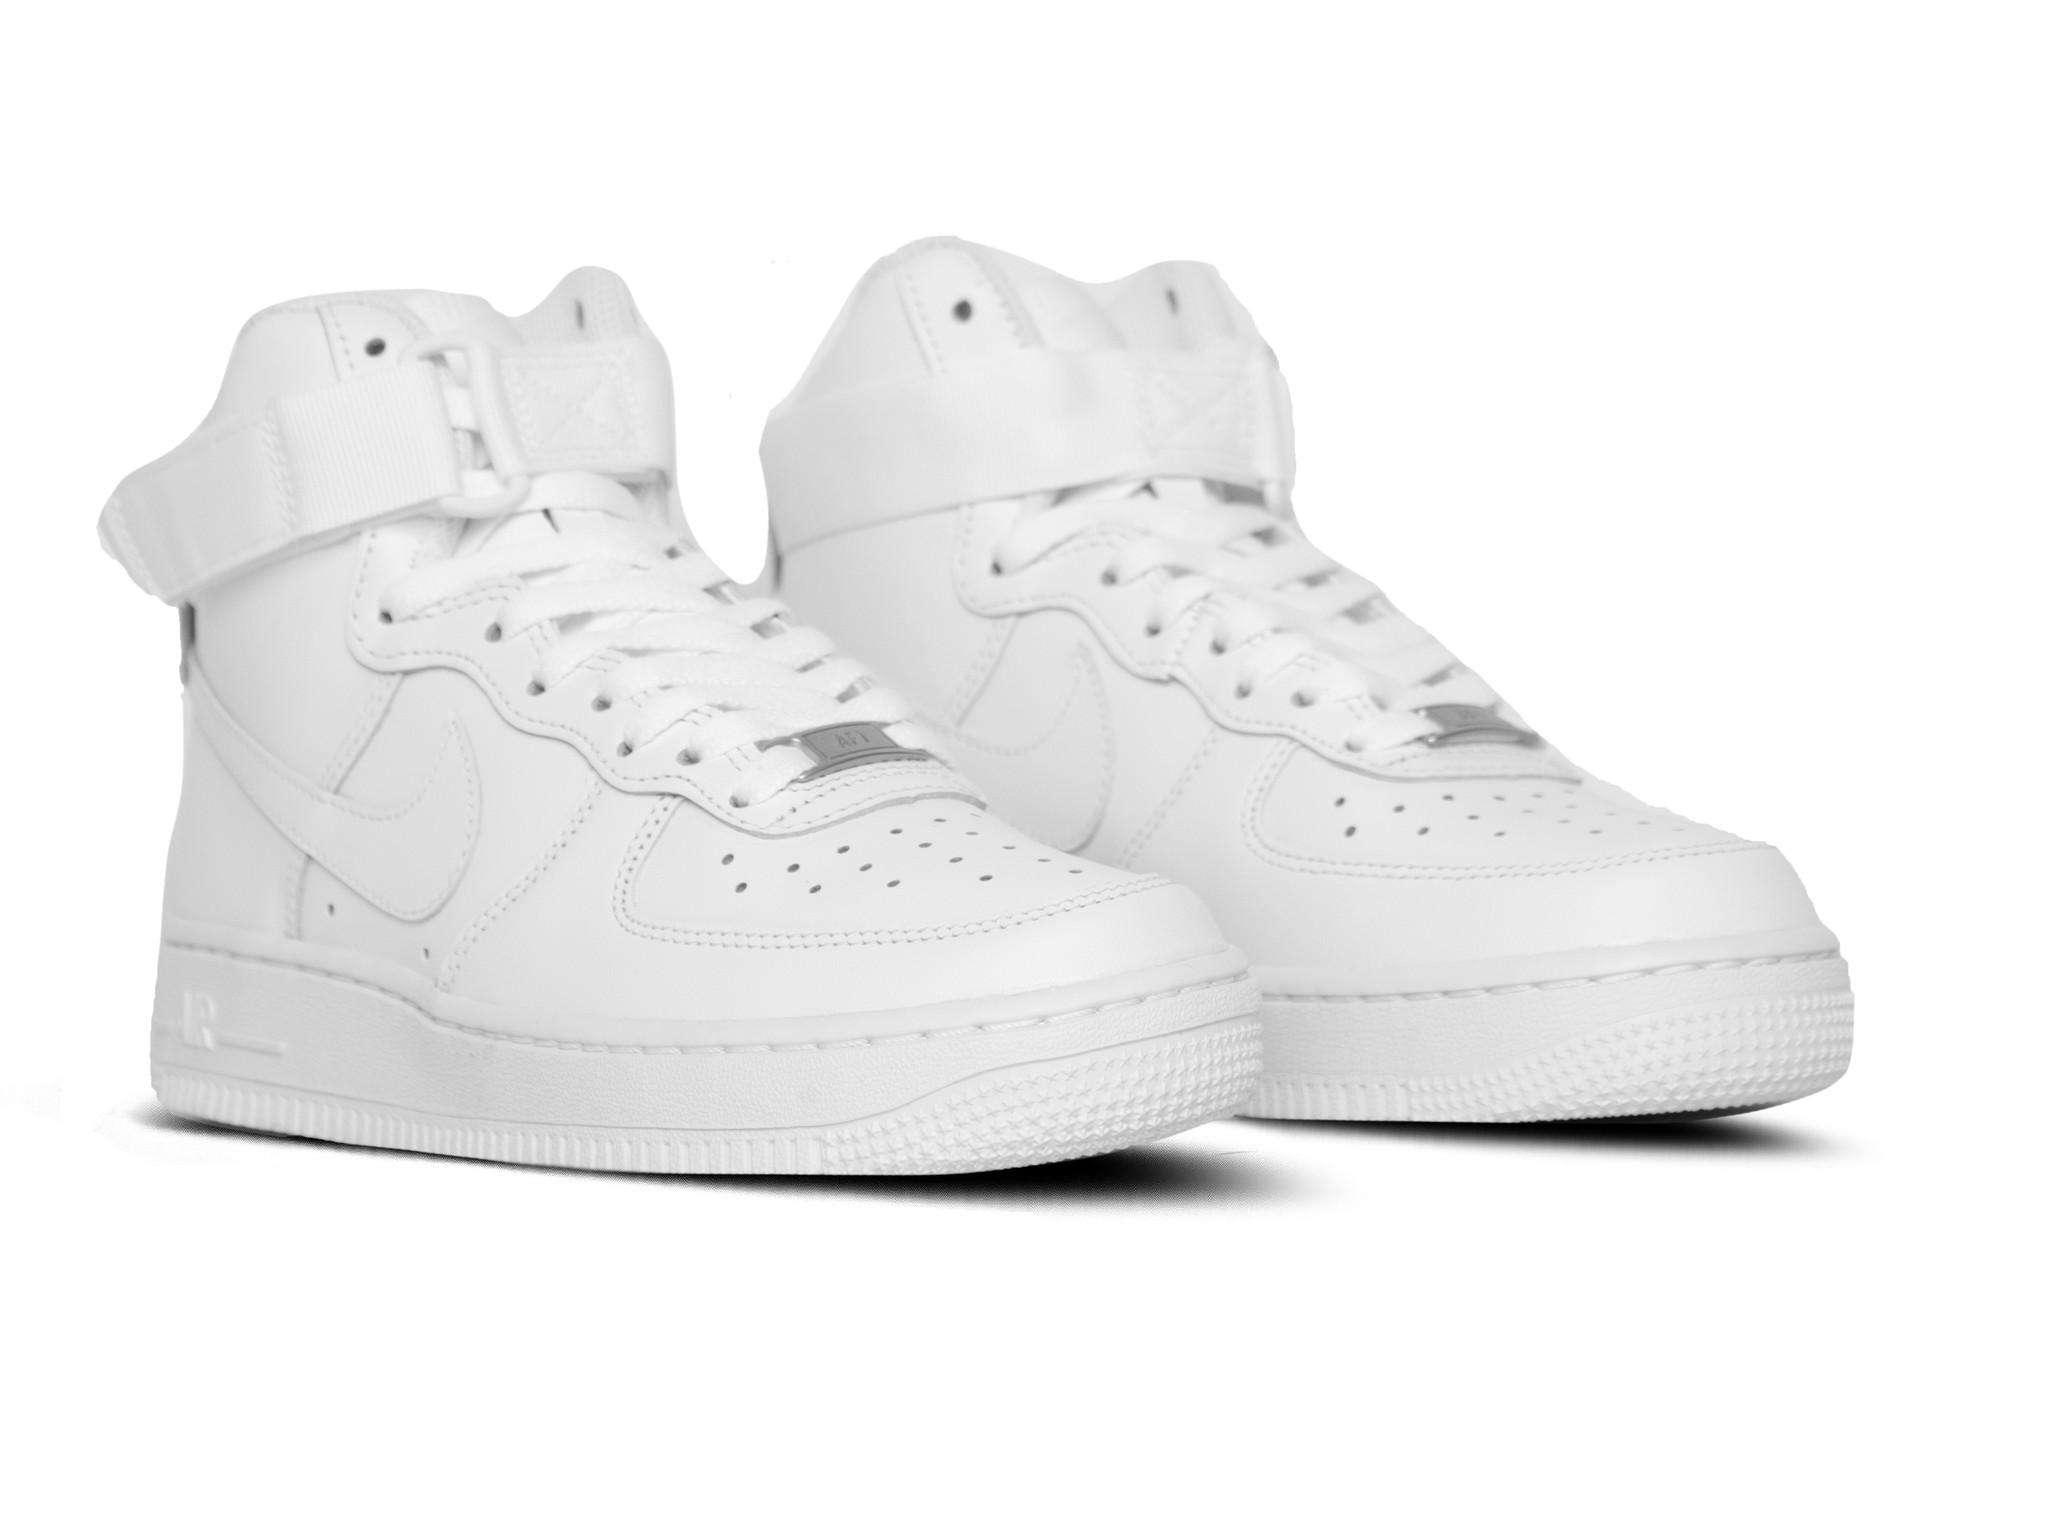 WMNS Air Force 1 High White White 334031 105 Bruut Online